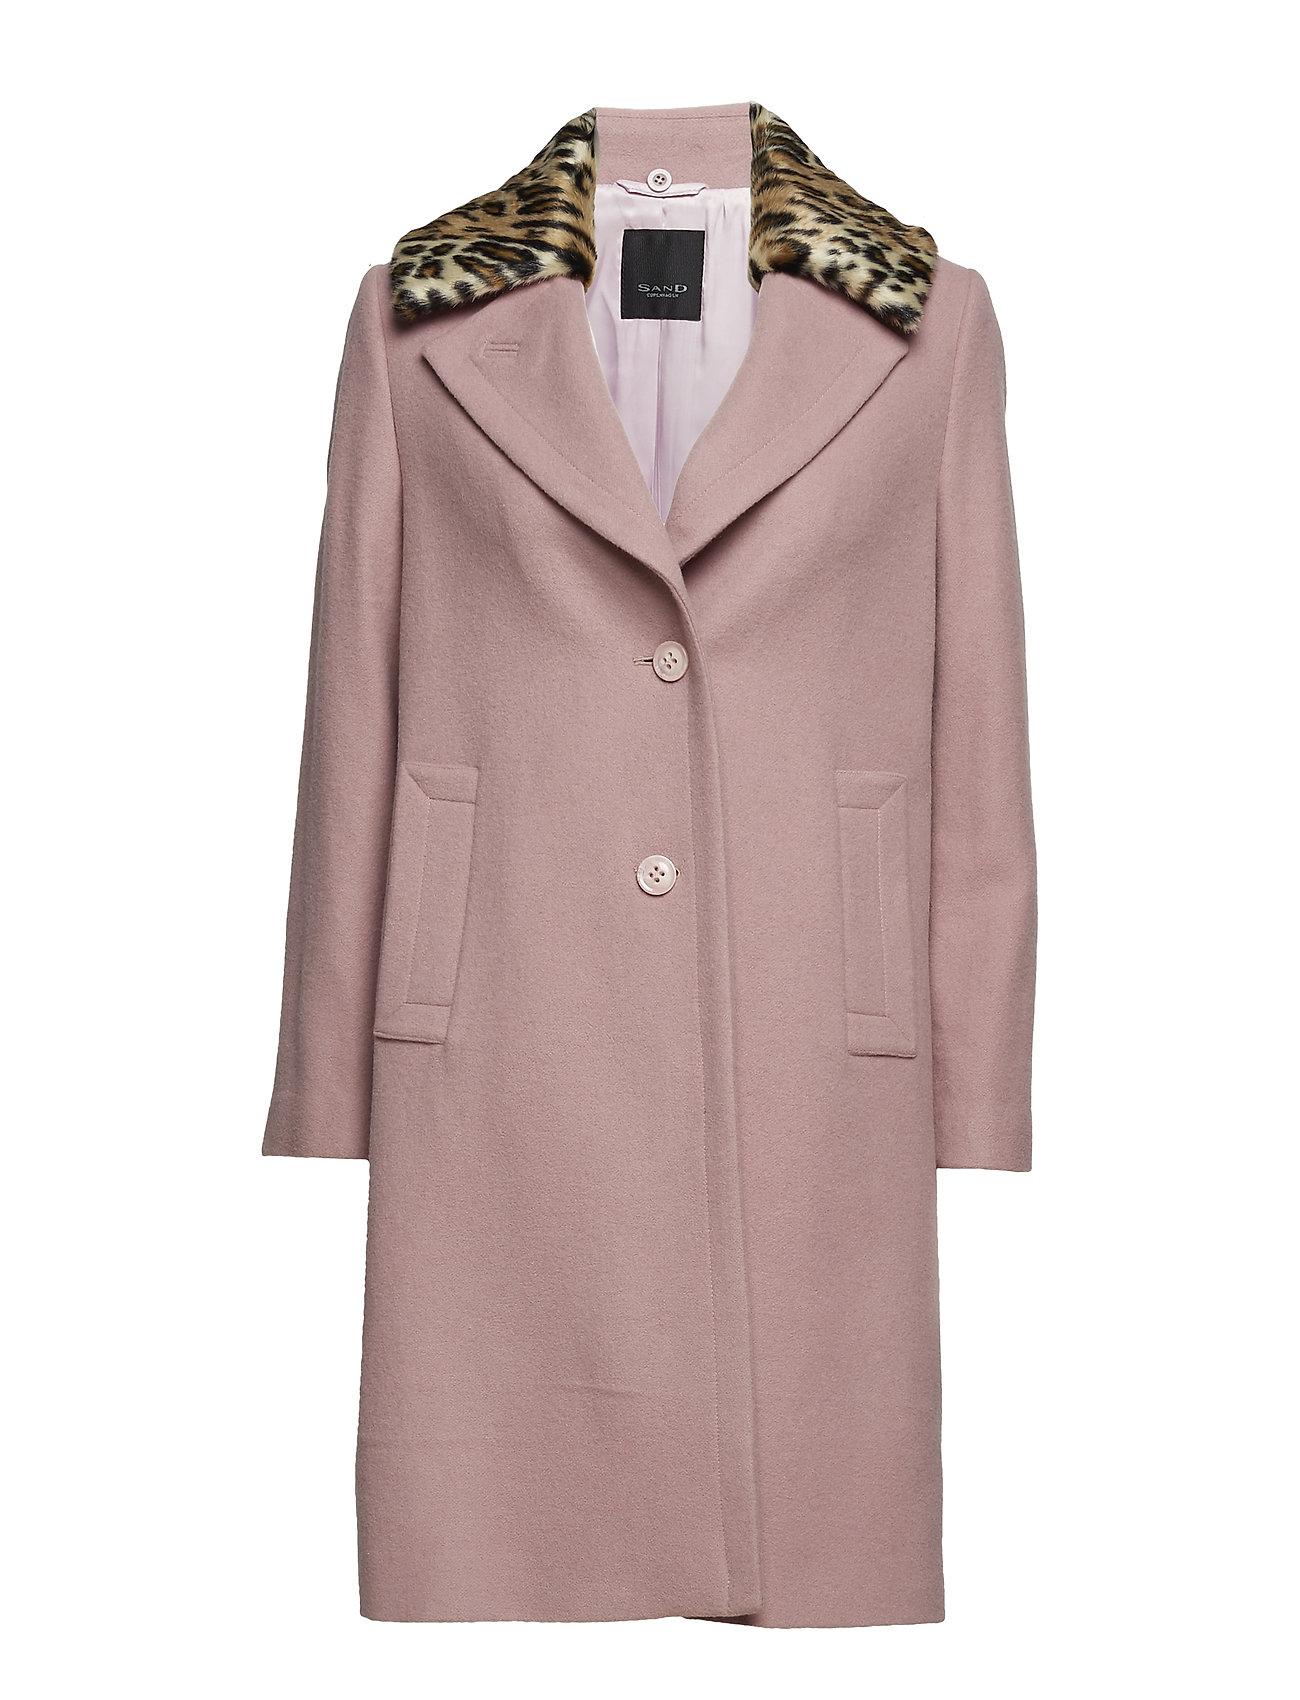 SAND Cashmere Cold Dye - Clareta L Fur